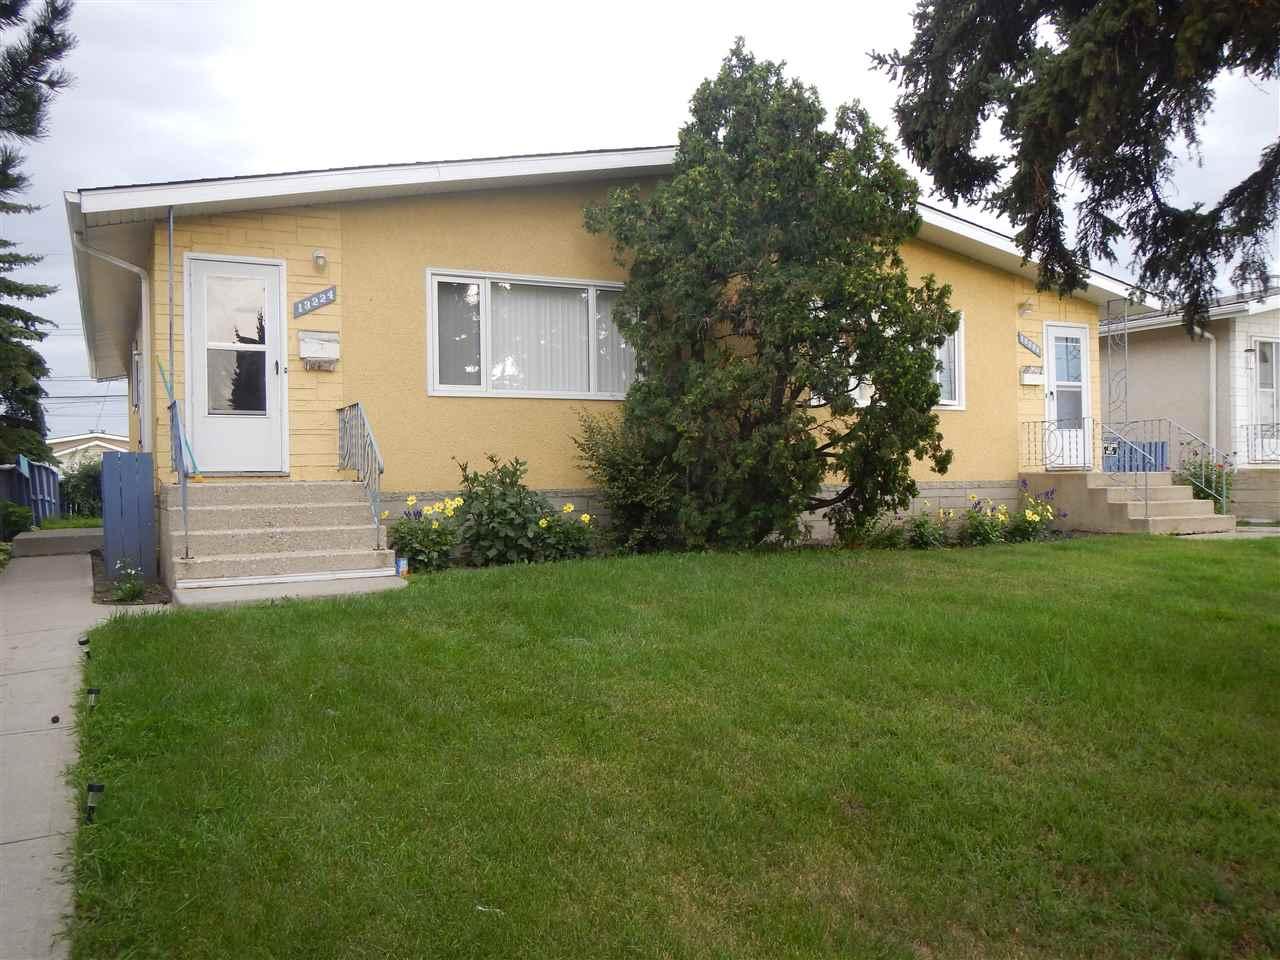 13224 81 Street, 5 bed, 3 bath, at $498,000